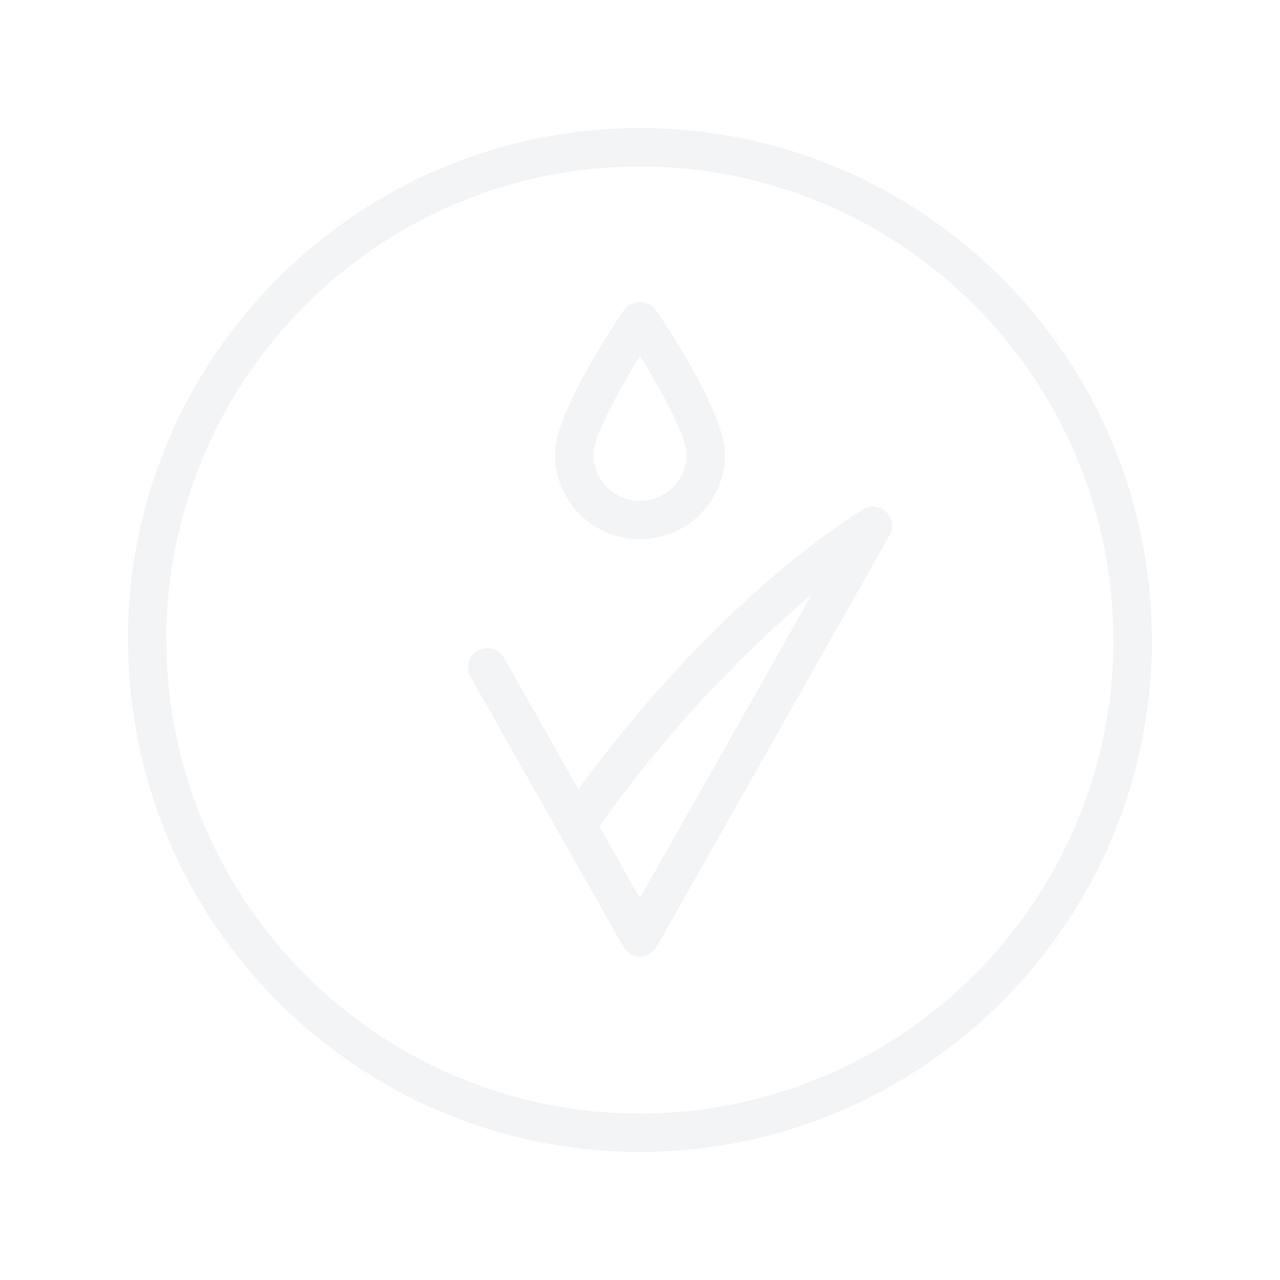 L'Oreal True Match Minerals Foundation SPF19 10g